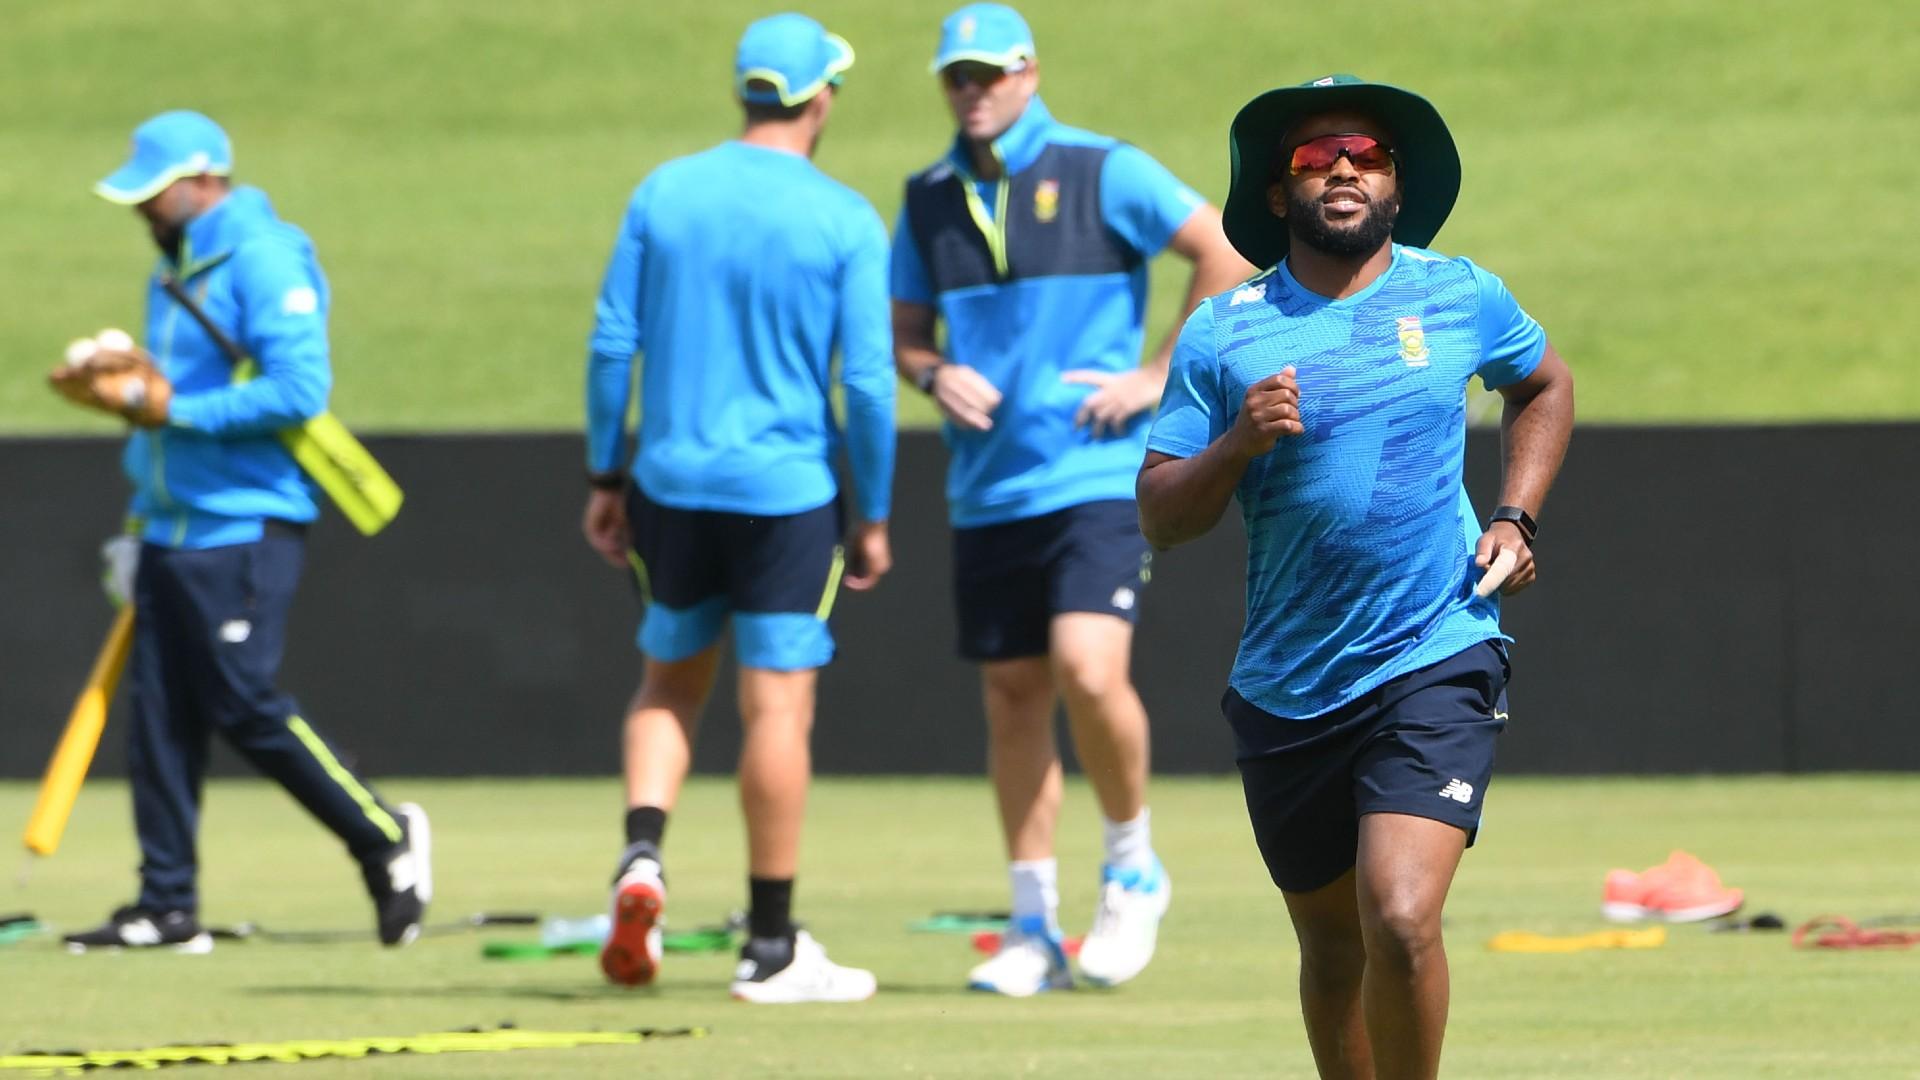 South Africa v Pakistan: New captain Bavuma starts at home as Proteas return to ODI action